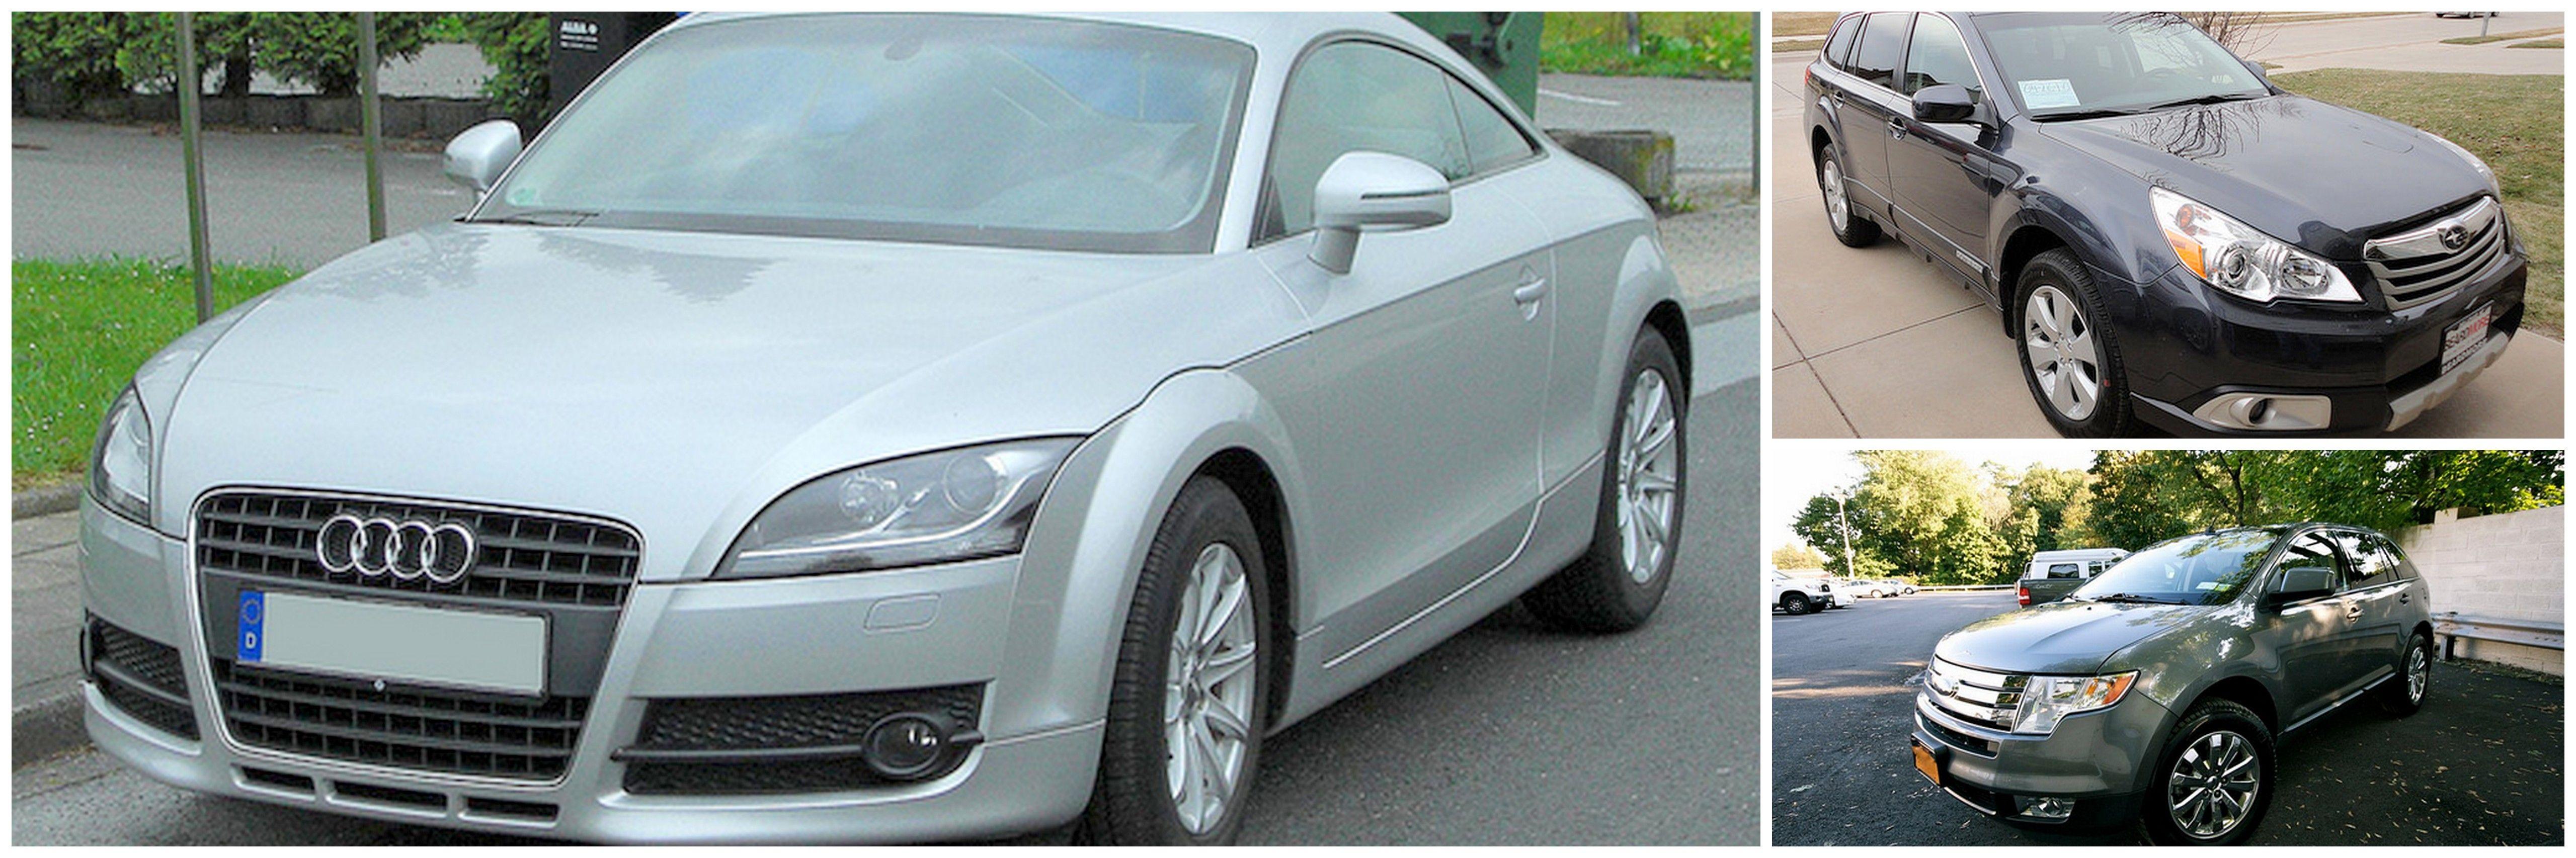 Best Used Cars Under 15000 Best Used Cars Under 15000